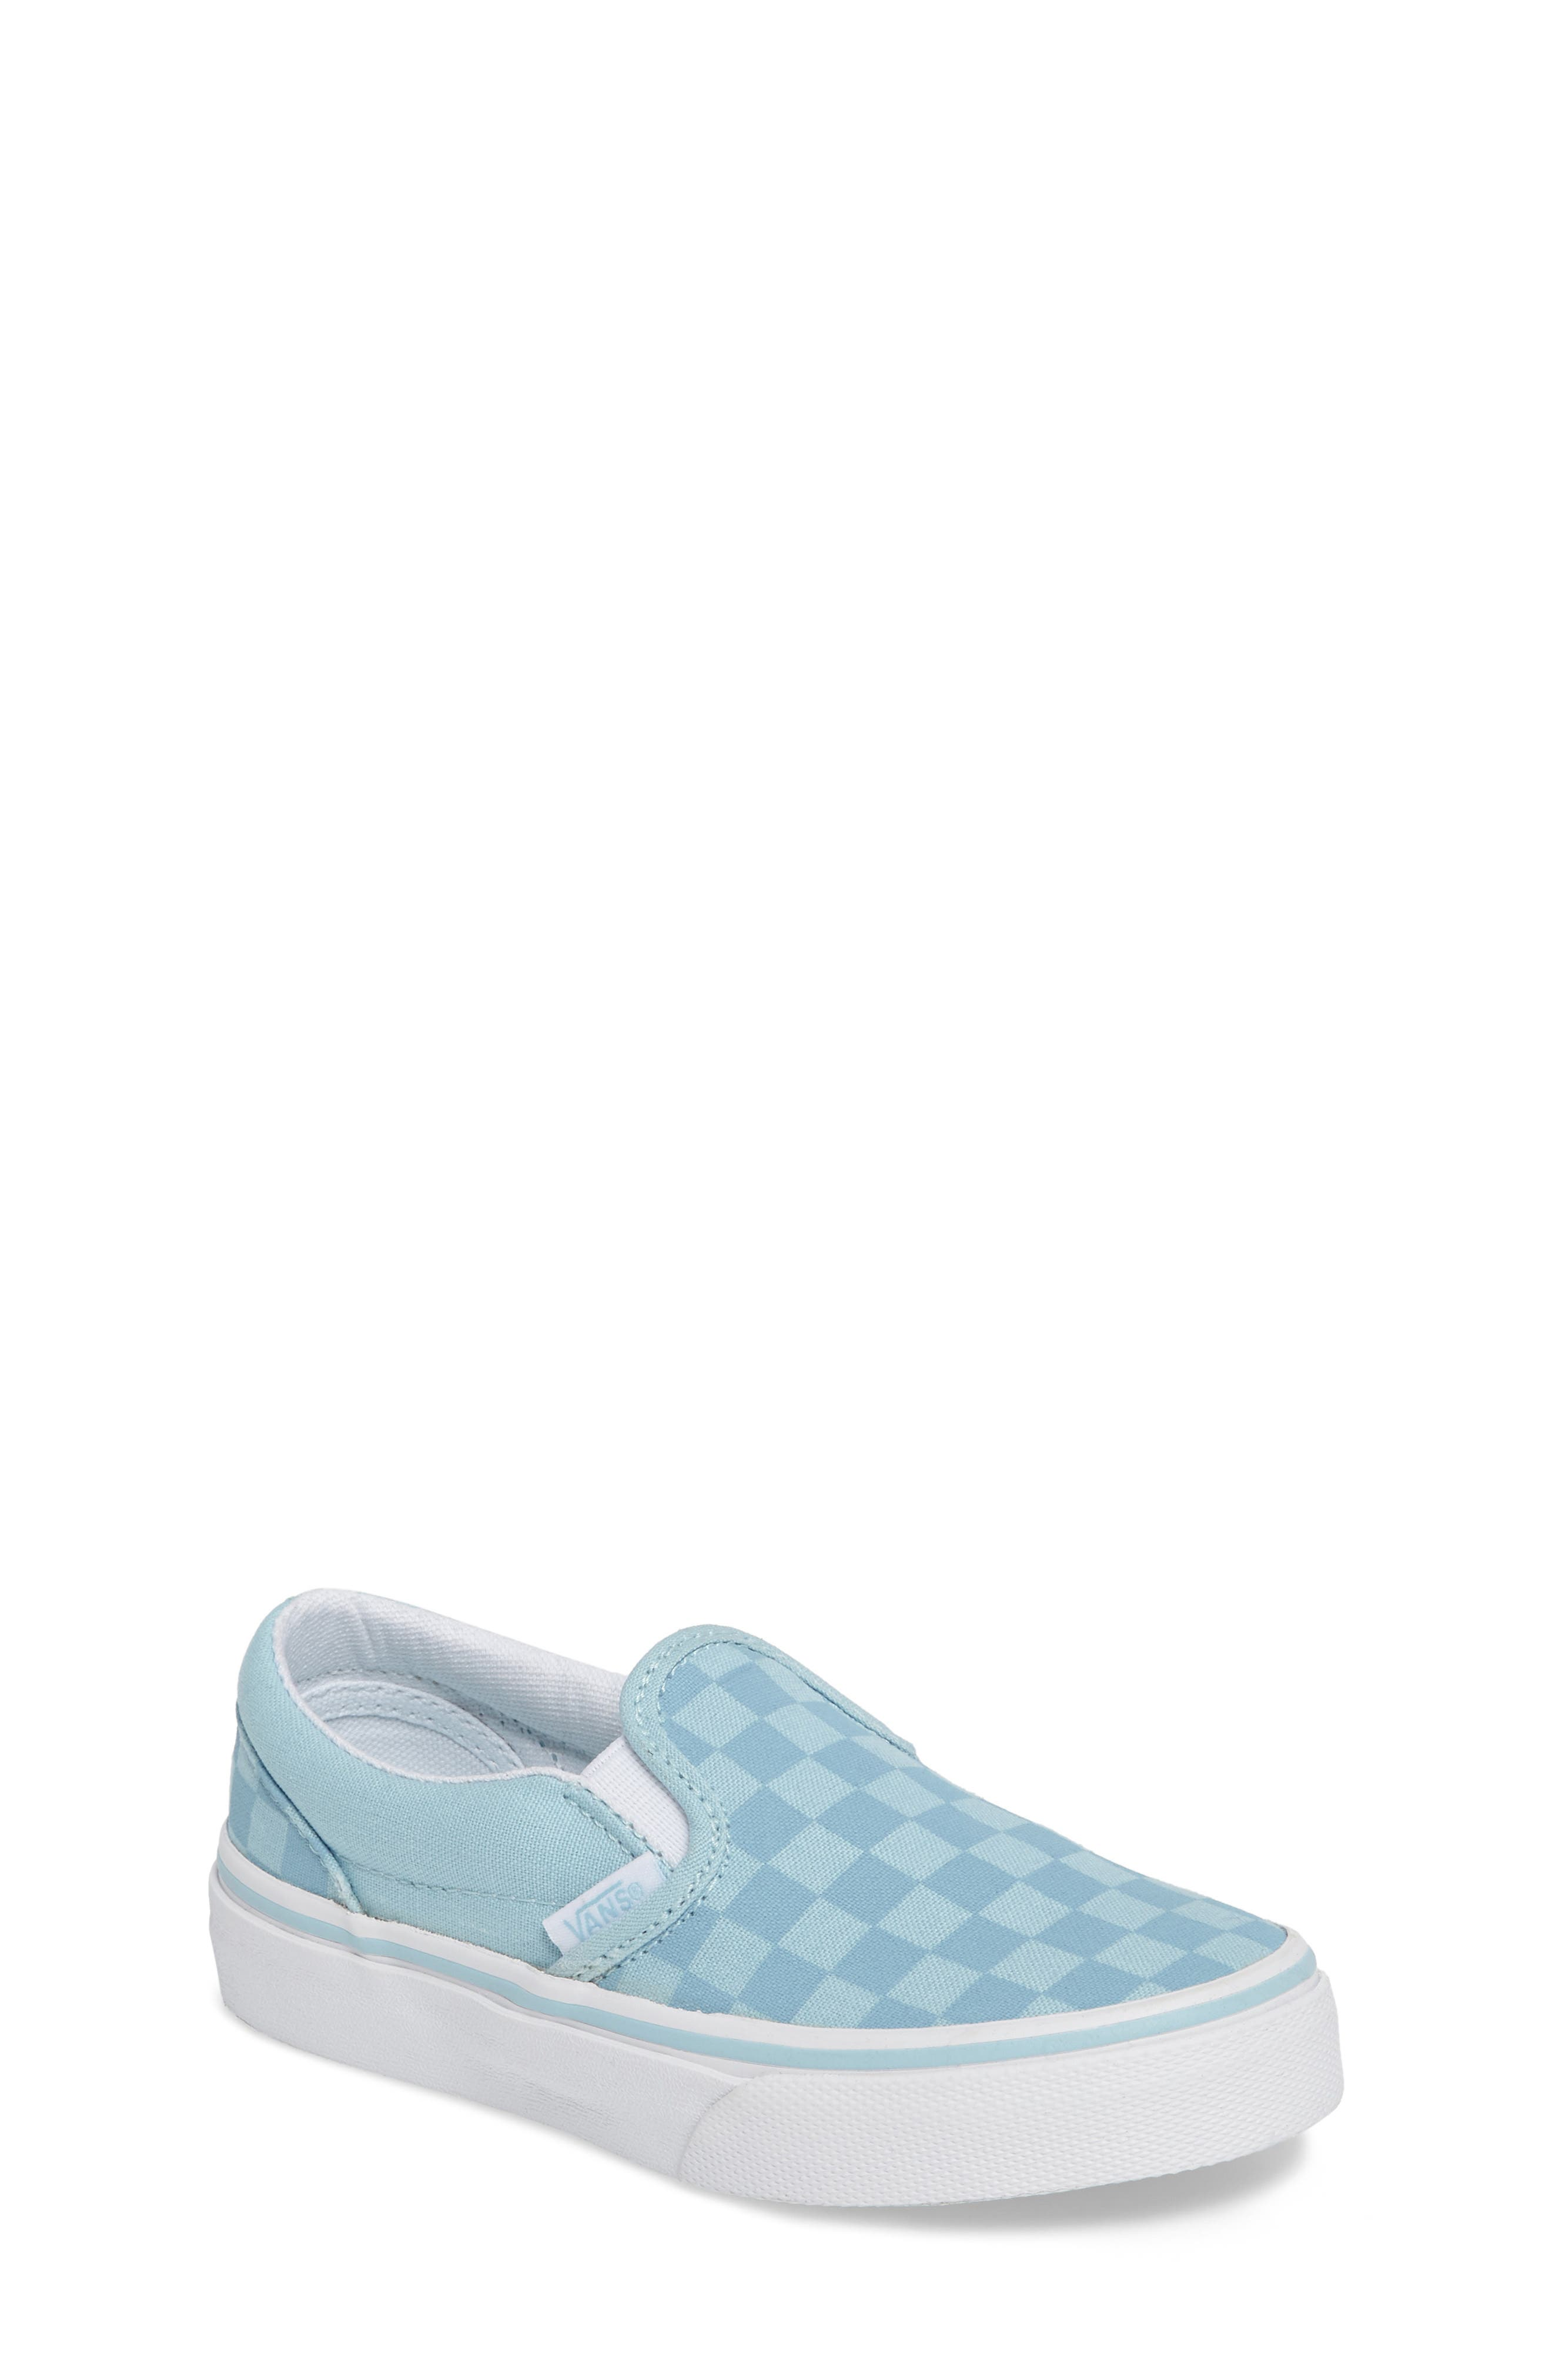 Alternate Image 1 Selected - Vans Classic Slip-On Sneaker (Walker, Toddler, Little Kid & Big Kid)